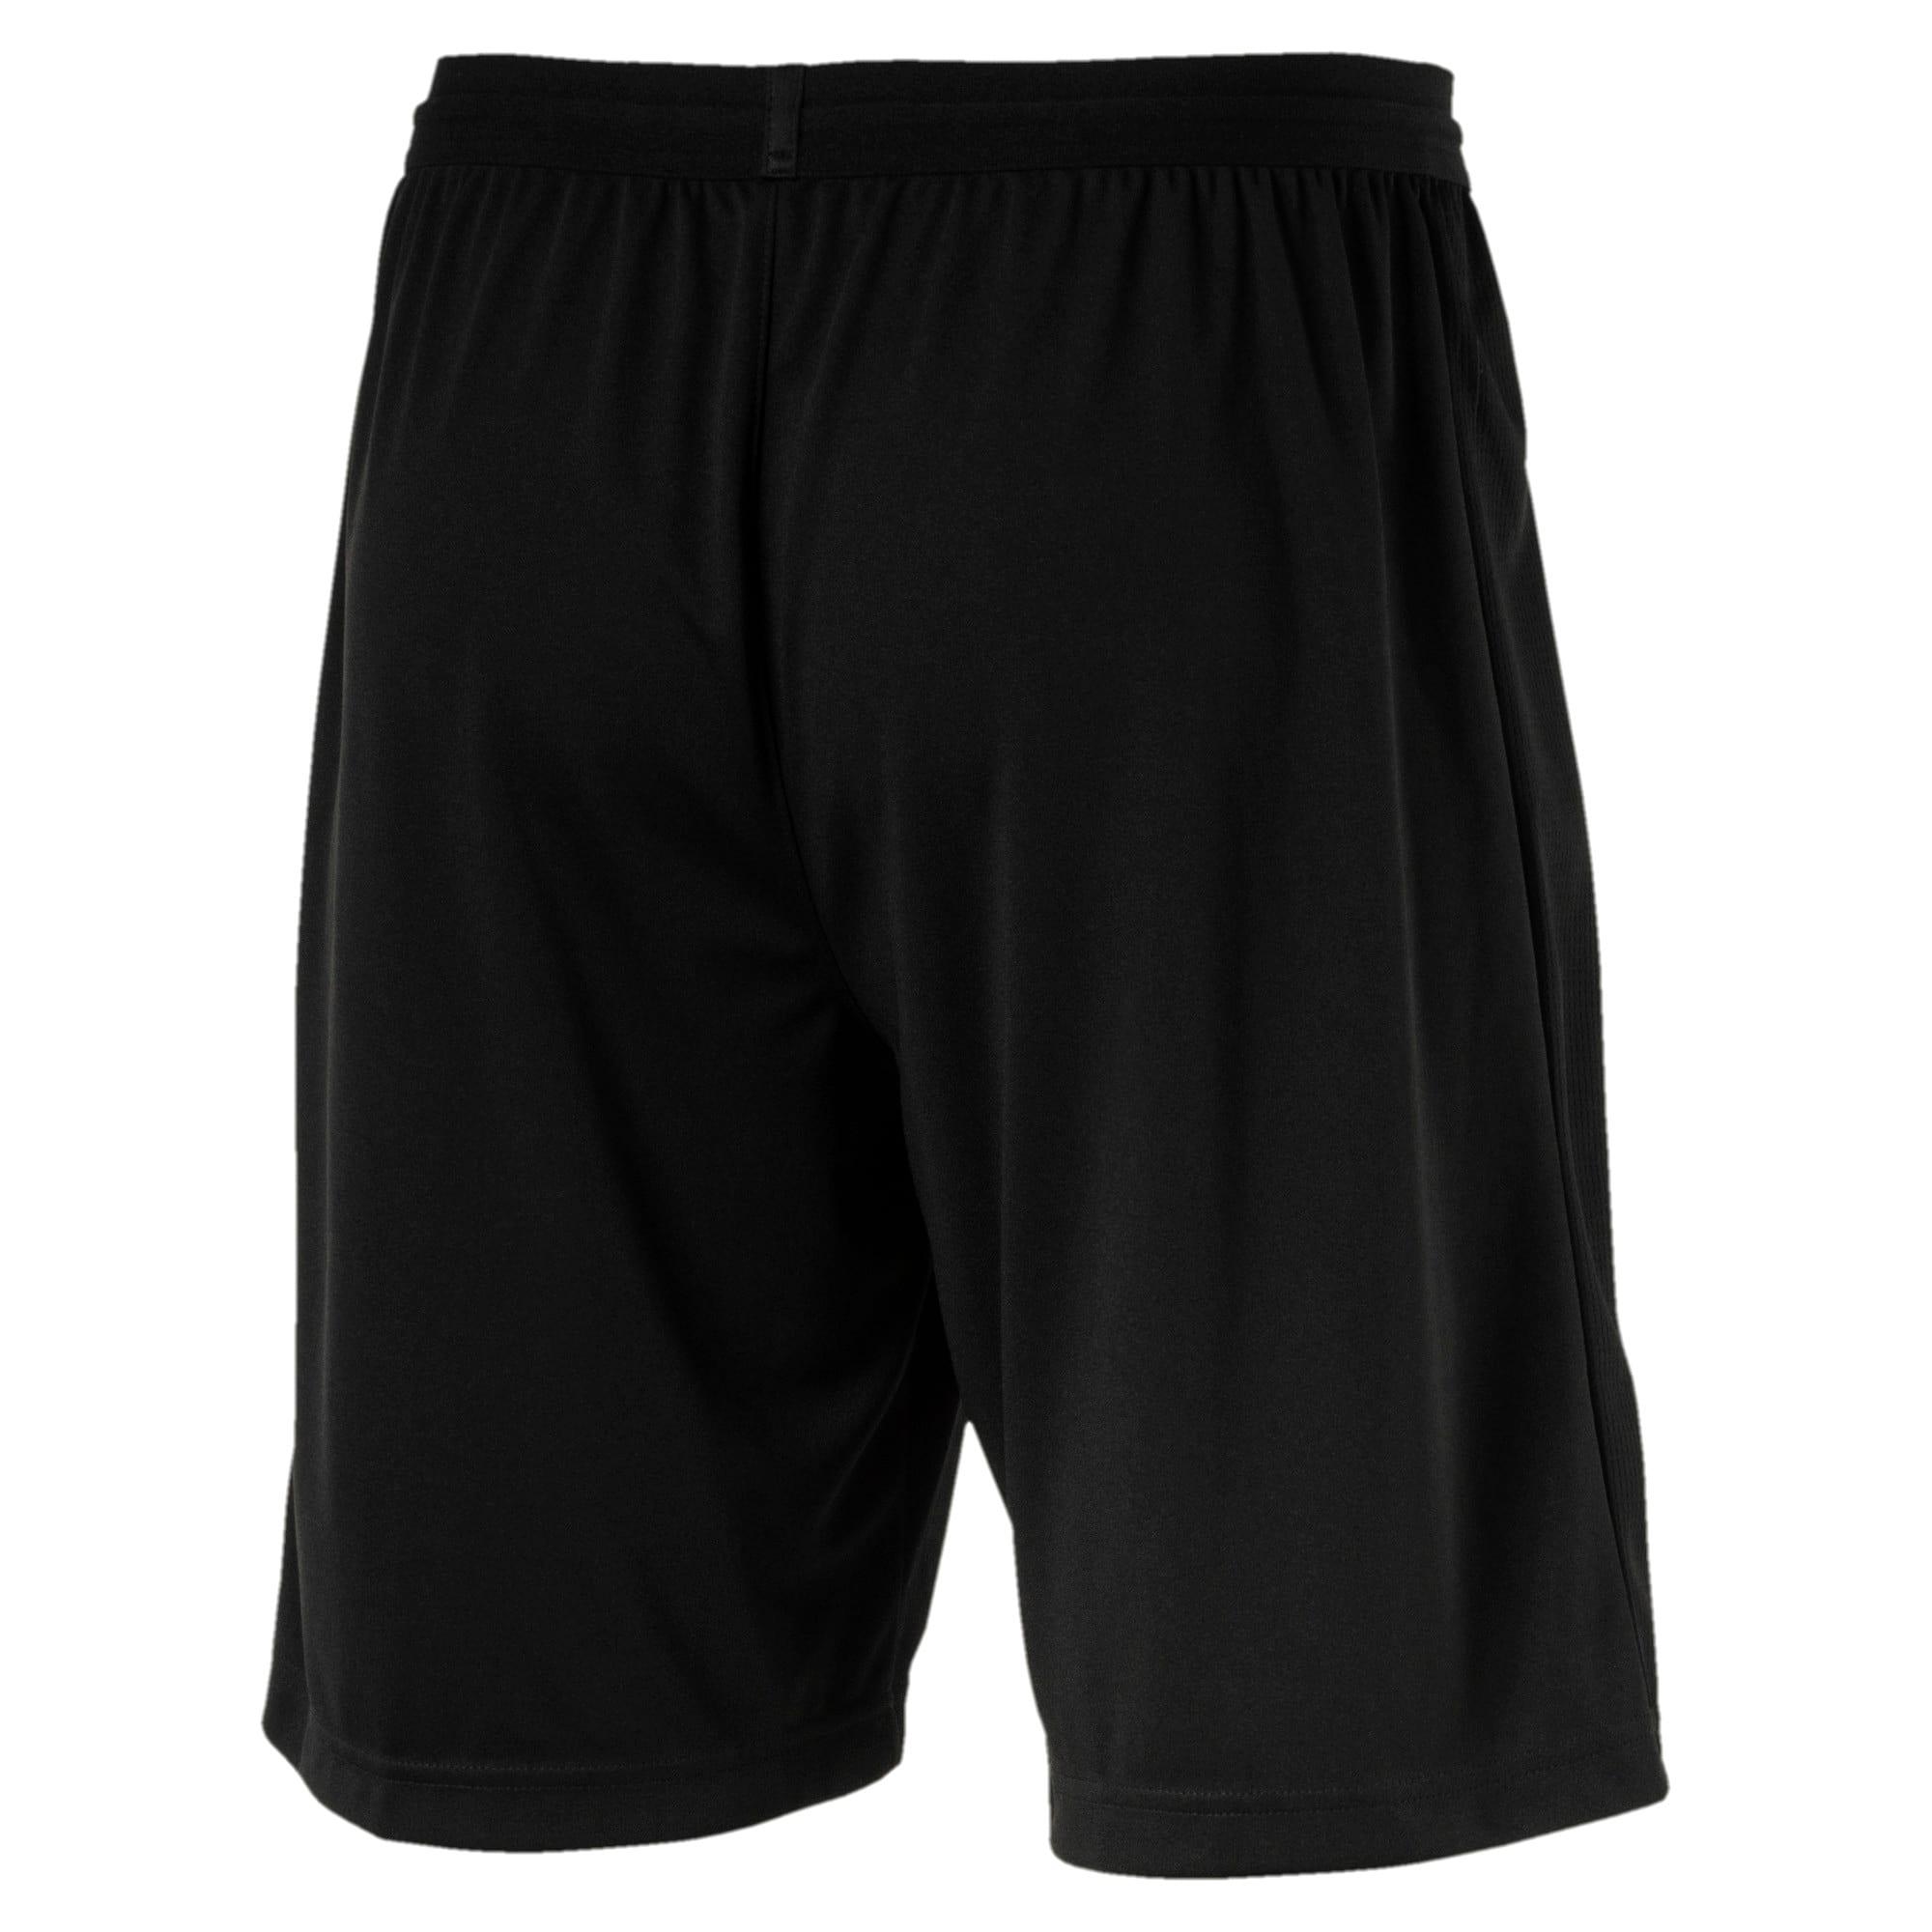 Thumbnail 2 of AC Milan Men's Replica Shorts, Puma Black-Puma White, medium